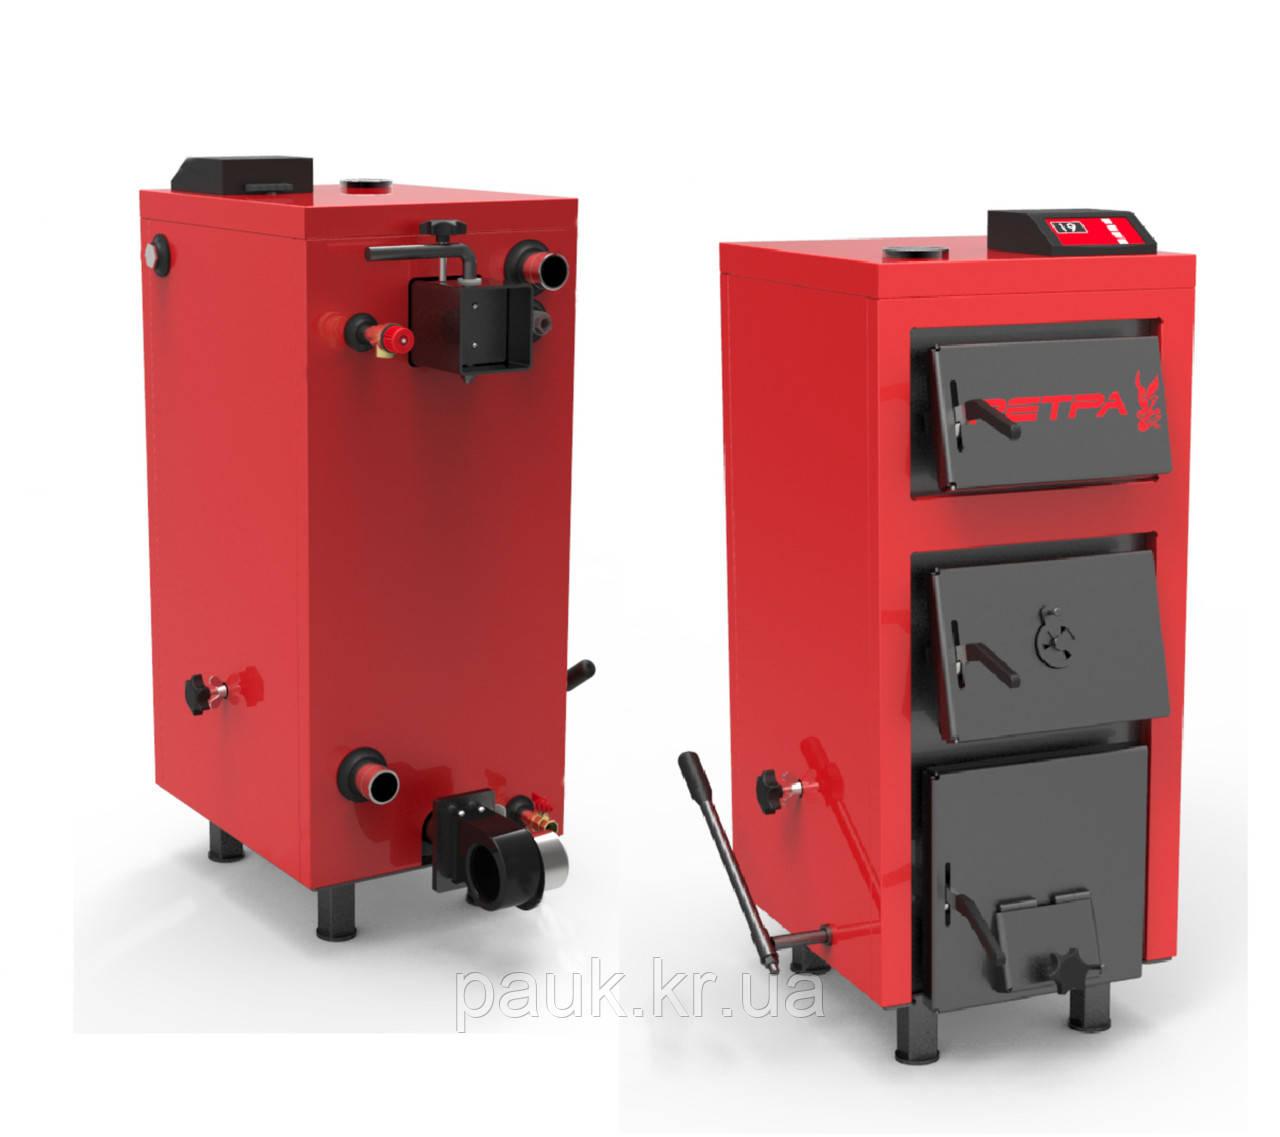 Котел Ретра-5М PLUS -20 кВт твердопаливний Ретра